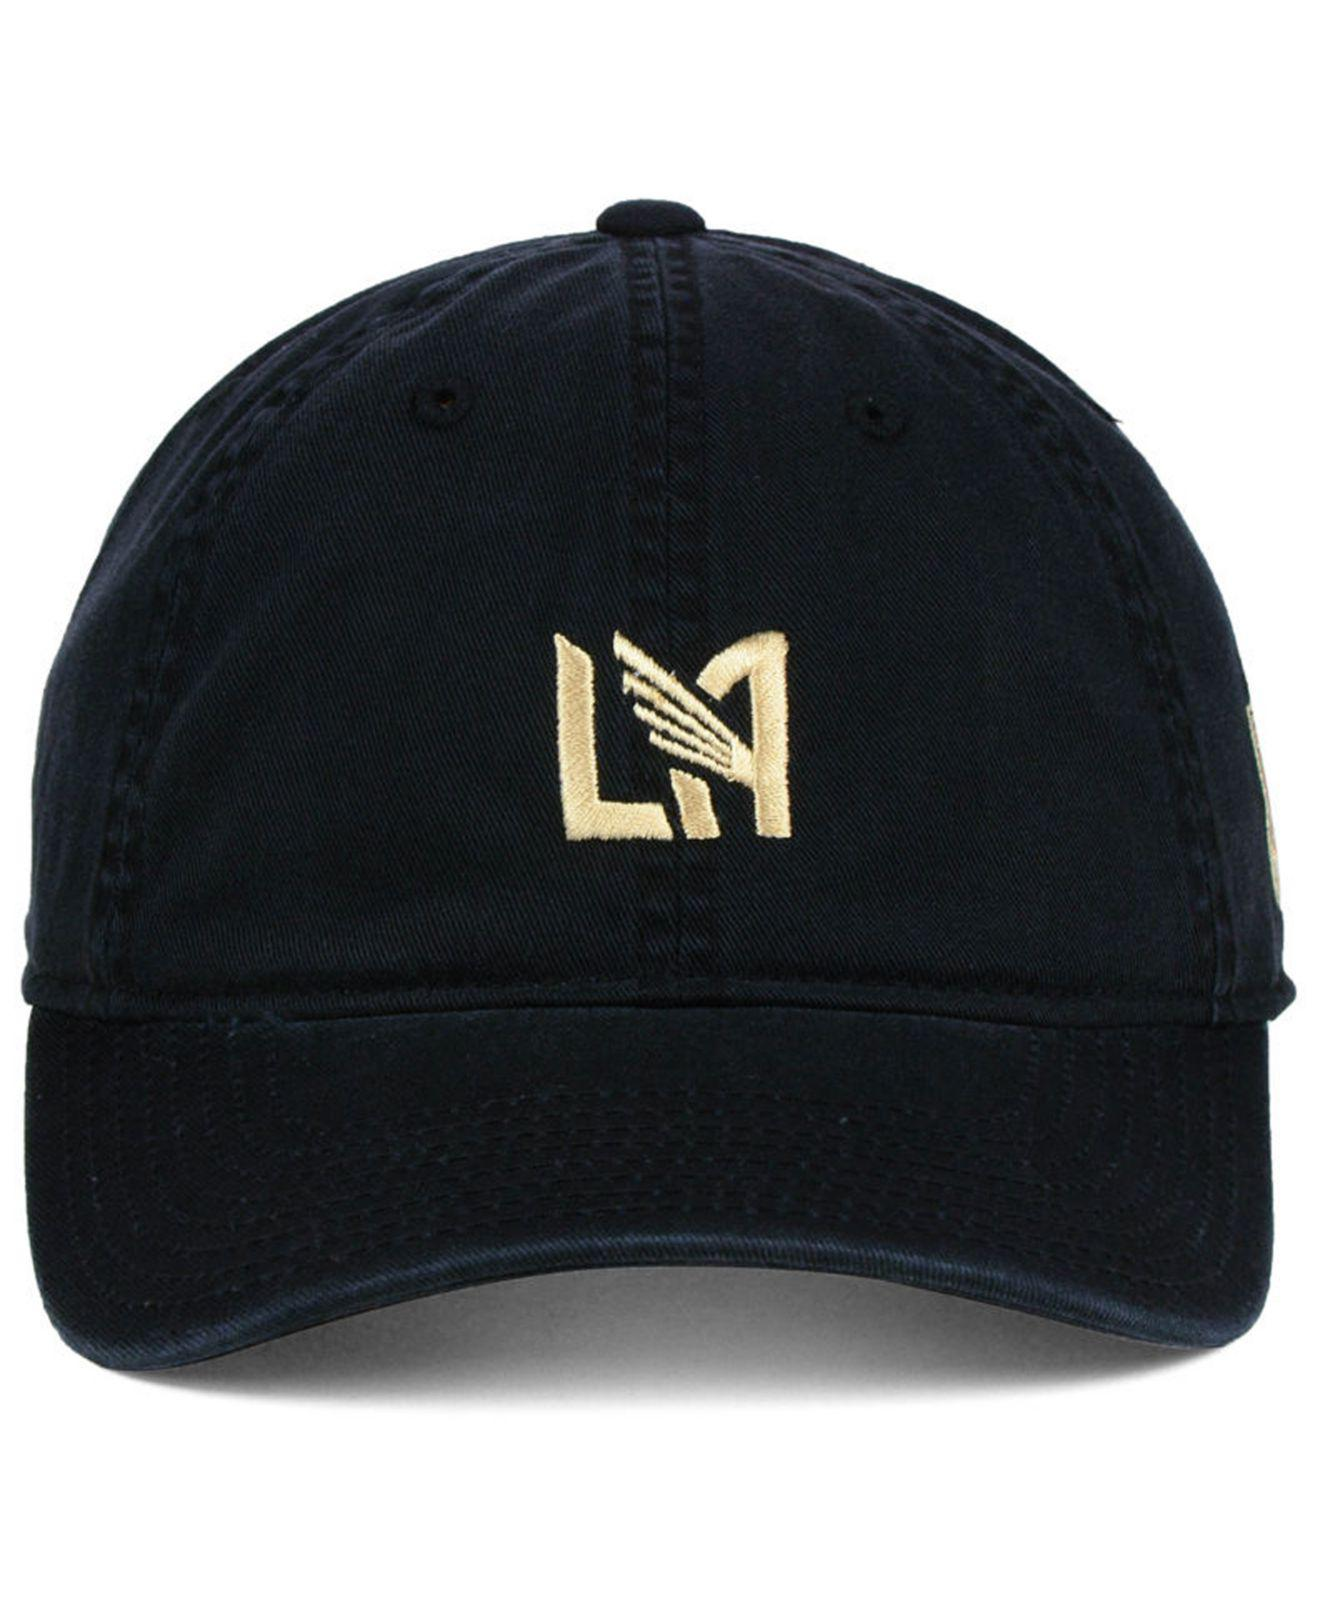 best service 6739c d253f adidas Los Angeles Football Club Partial Logo Dad Cap in Black for ...